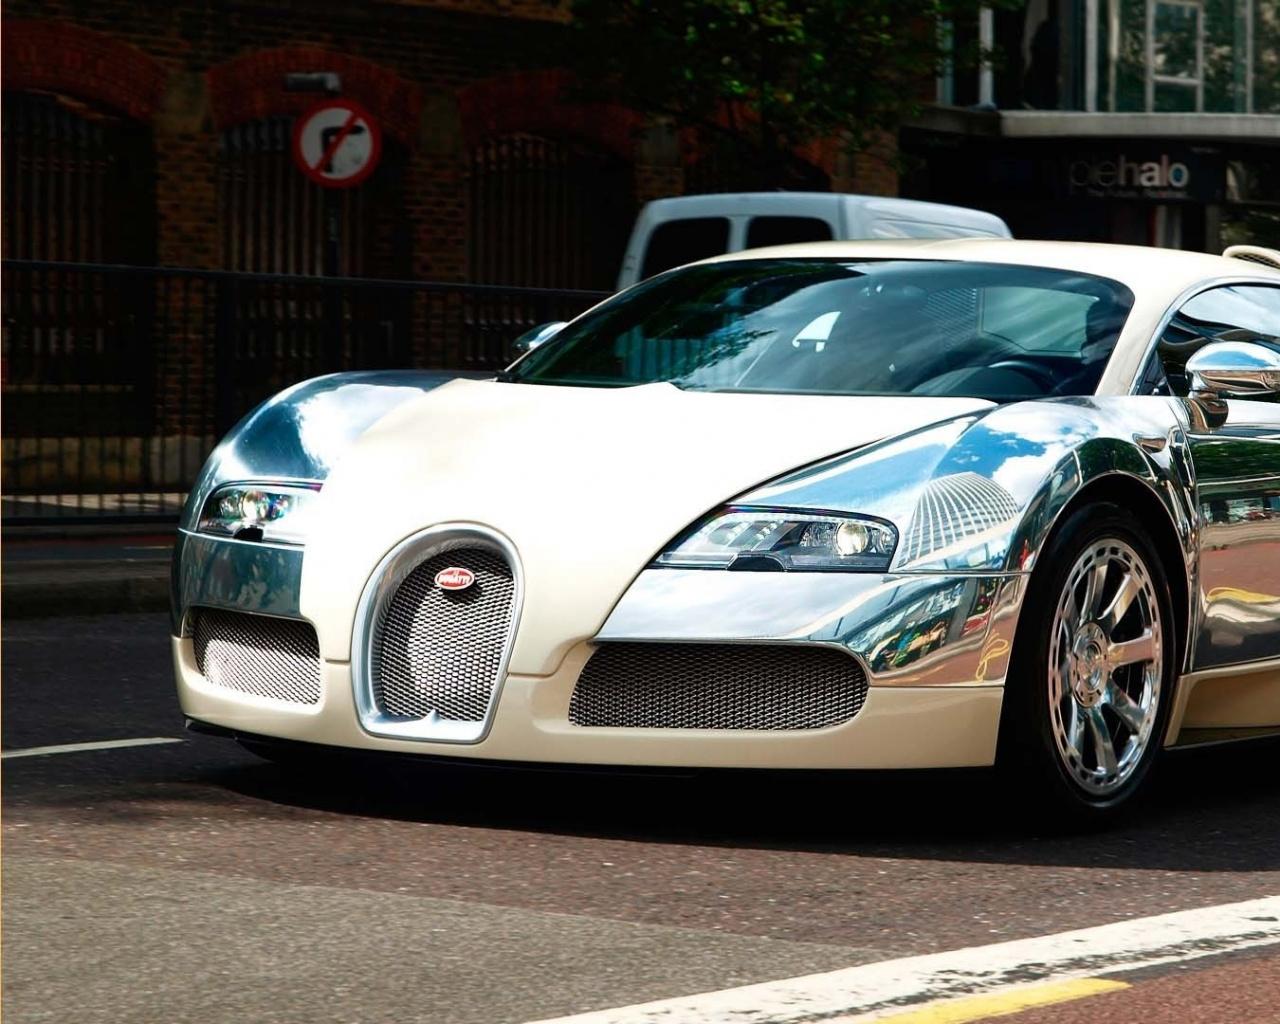 Bugatti, Land Vehicle, Sports Car, Supercar, Bugatti - Bugatti Veyron Centenaire White , HD Wallpaper & Backgrounds